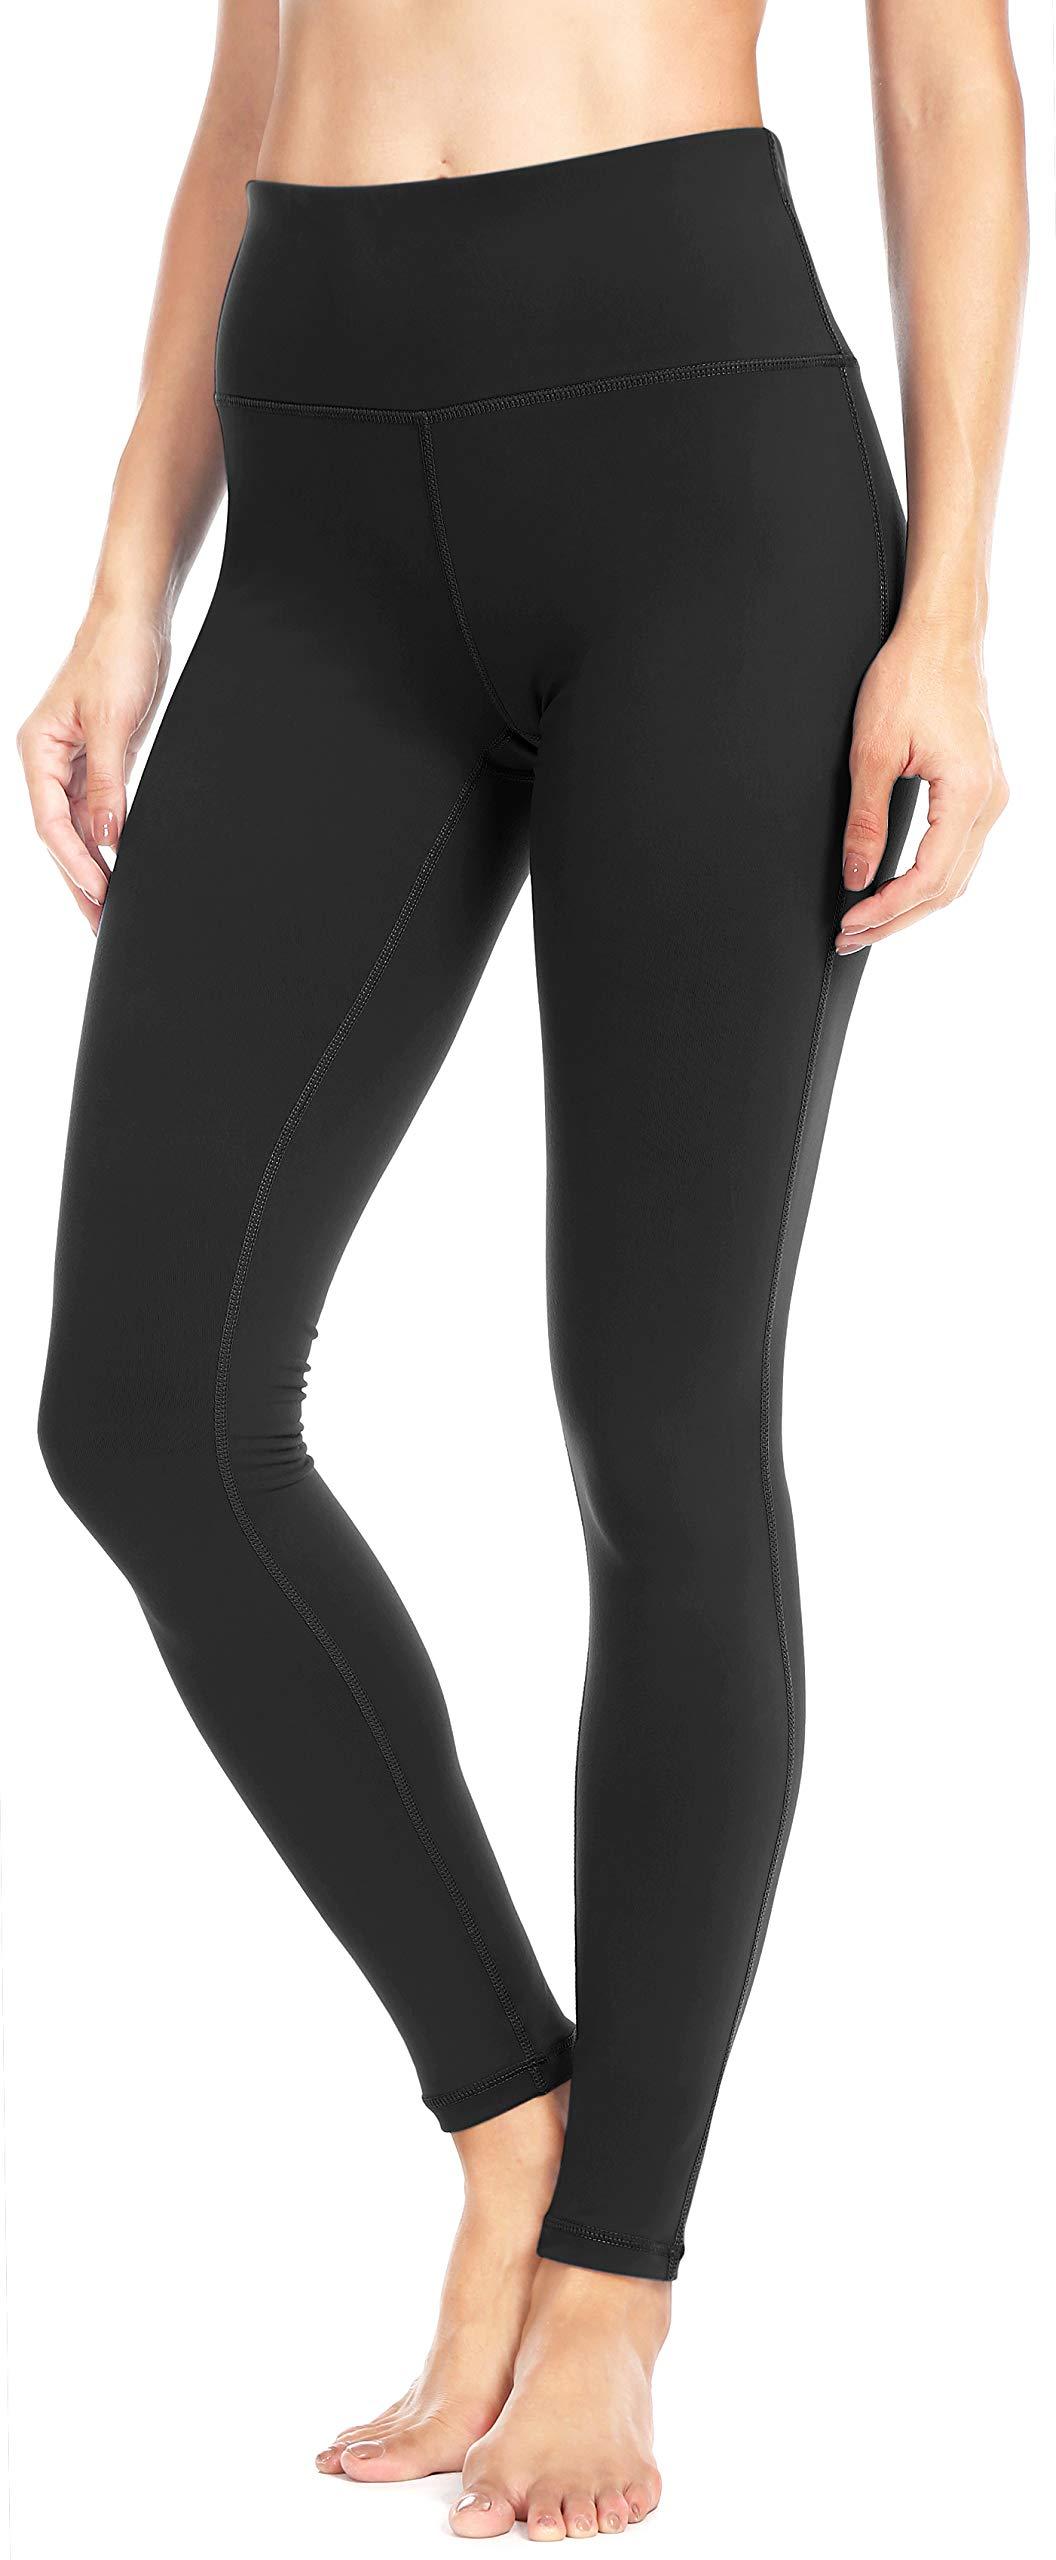 Queenie Ke Women Power Flex Yoga Pants Workout Running Leggings Size XS Color Midnight Black Long